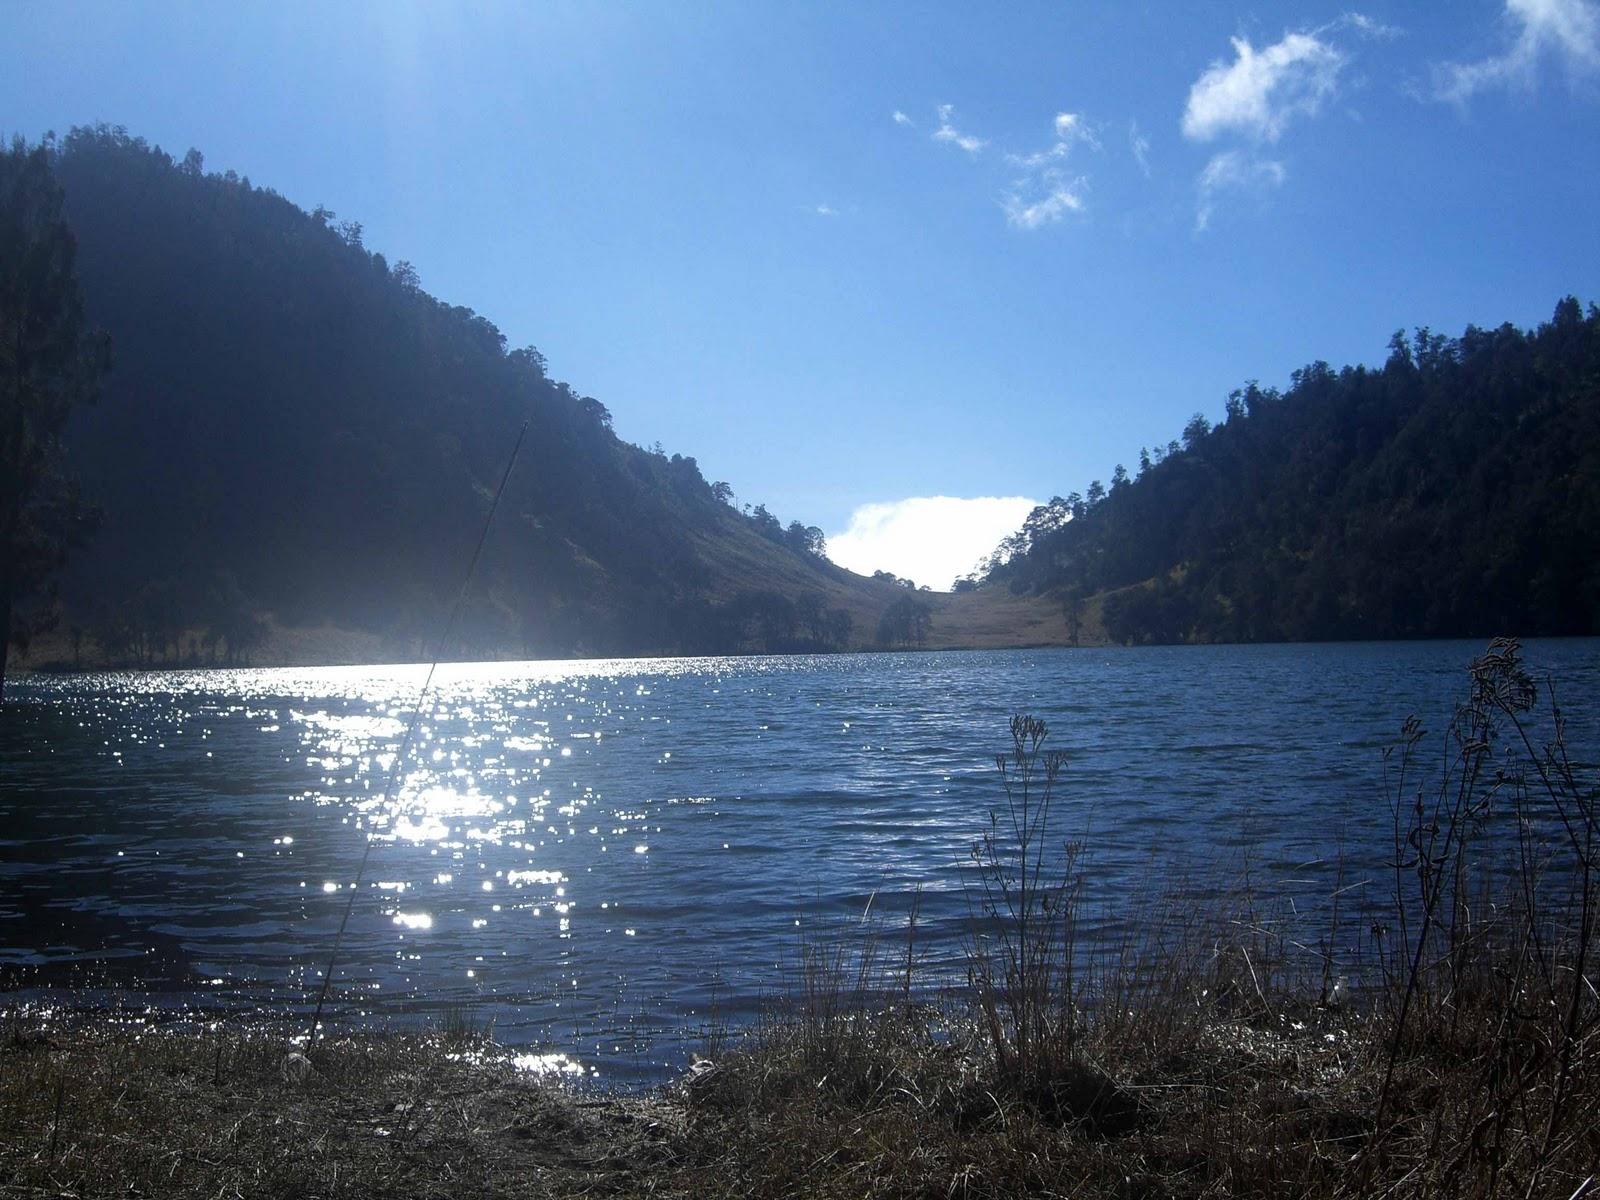 Hidup Itu Indah: Eksotisme Danau Ranu Kumbolo